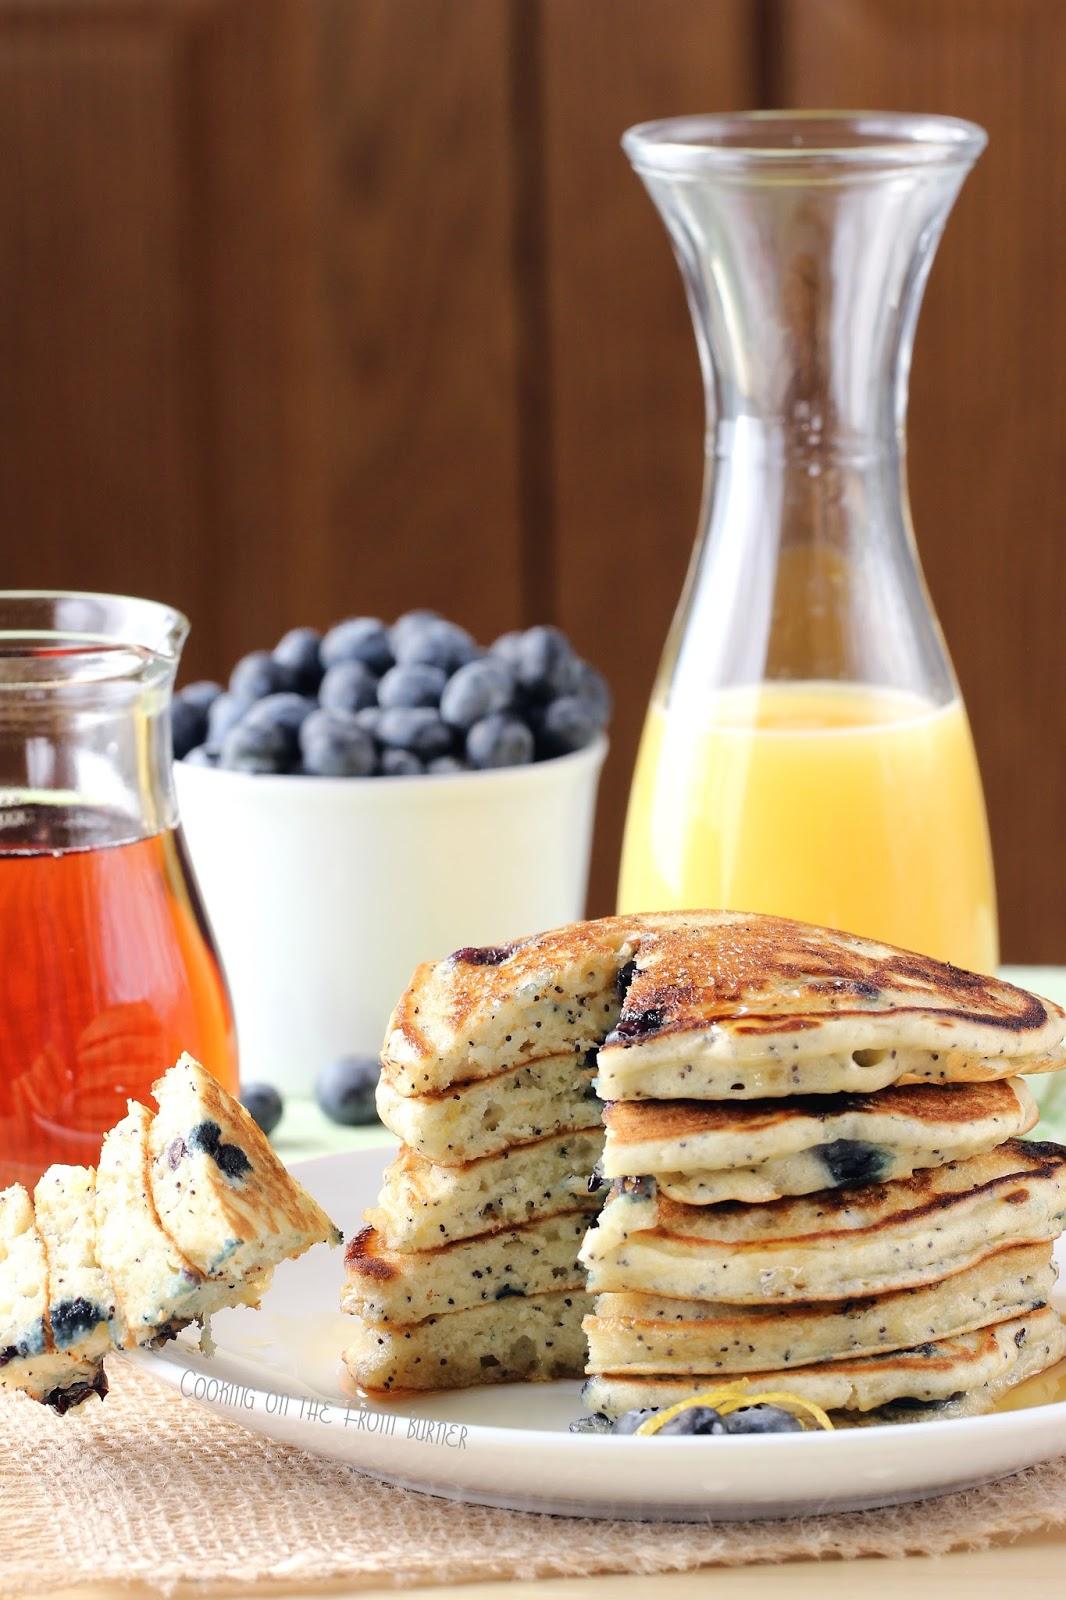 Lemon Blueberry Poppy Seed Pancakes | Cooking on the Front Burner #lemonblueberrypancakes #brunch